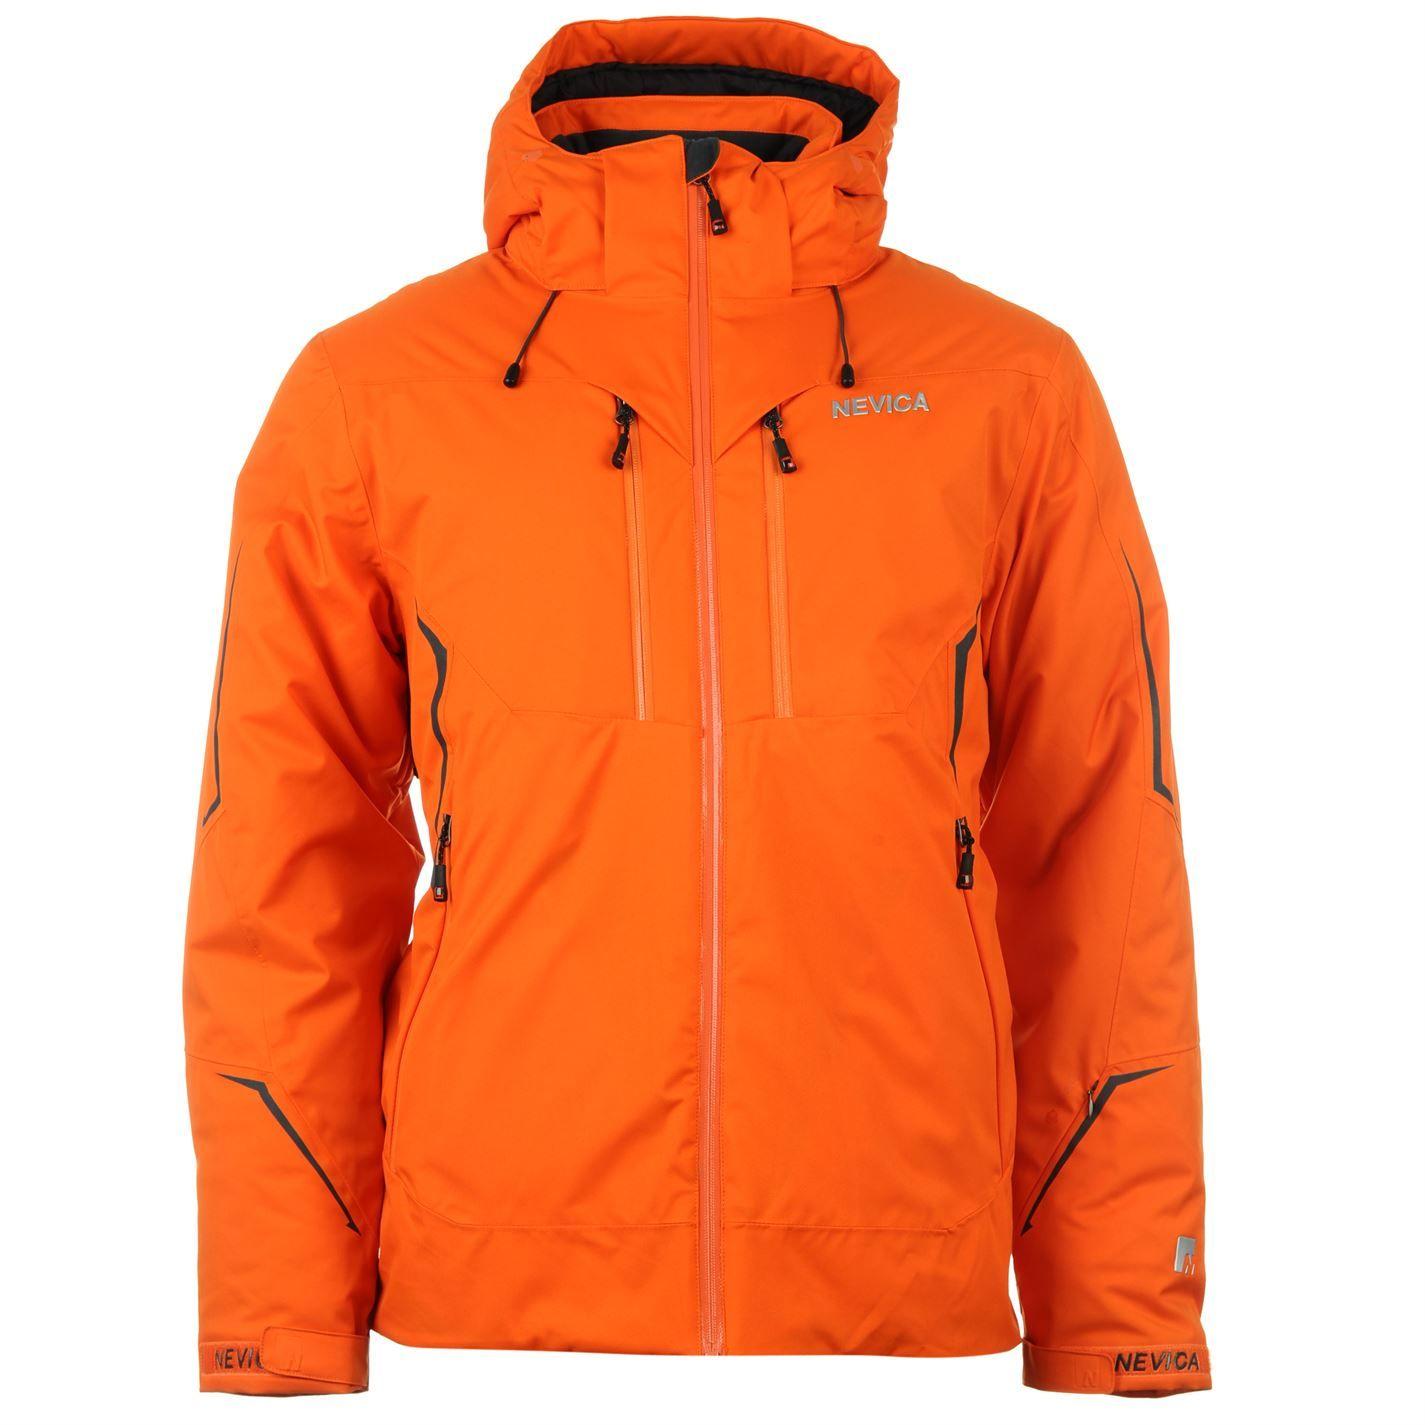 Nevica Nevica Vail Ski Jacket Mens Ski Jackets We